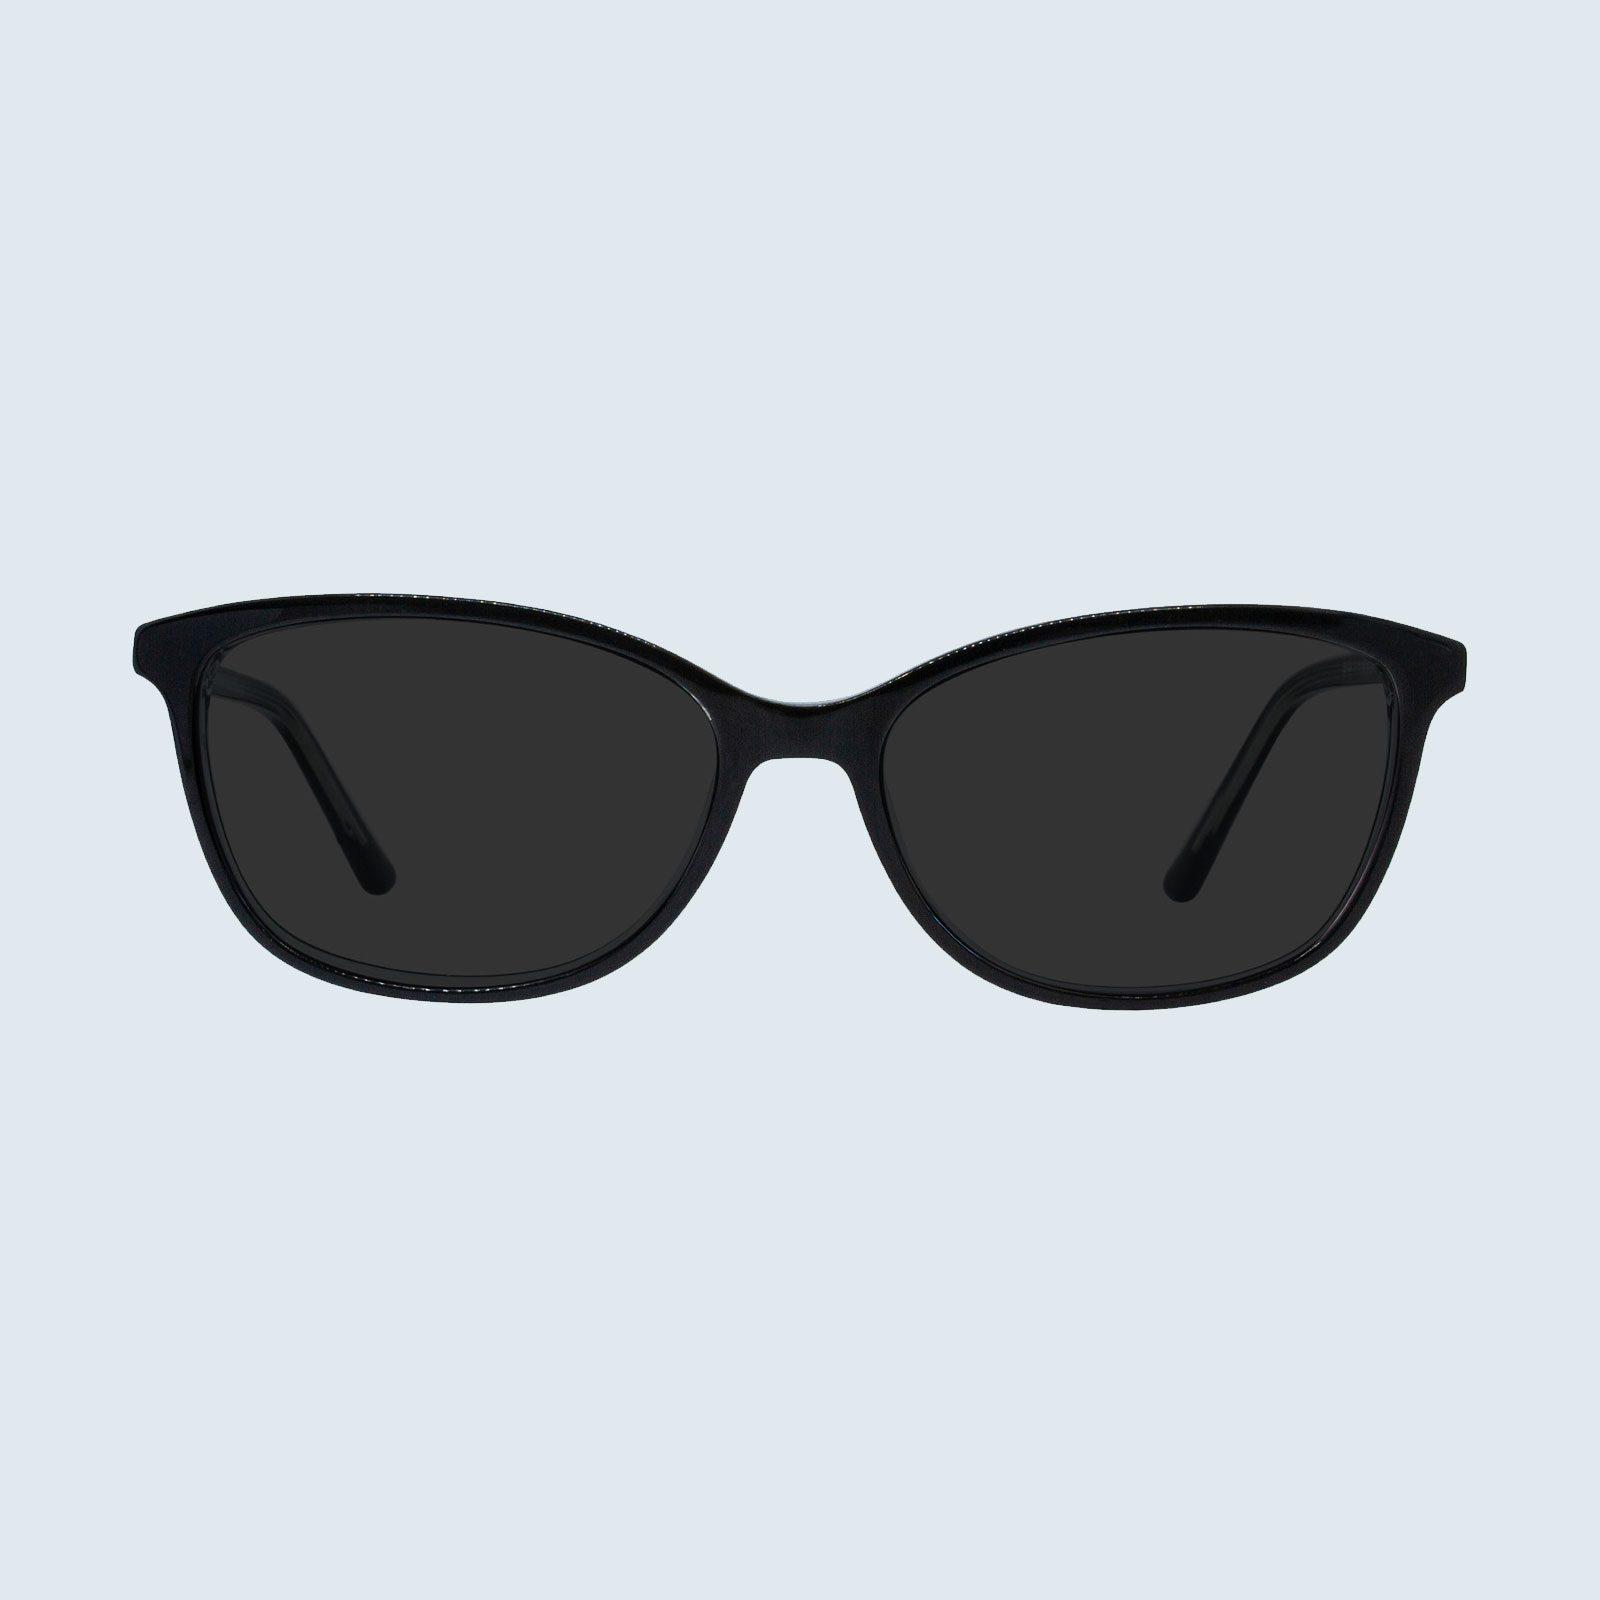 Levica Polarized Sunglasses at Lensabl